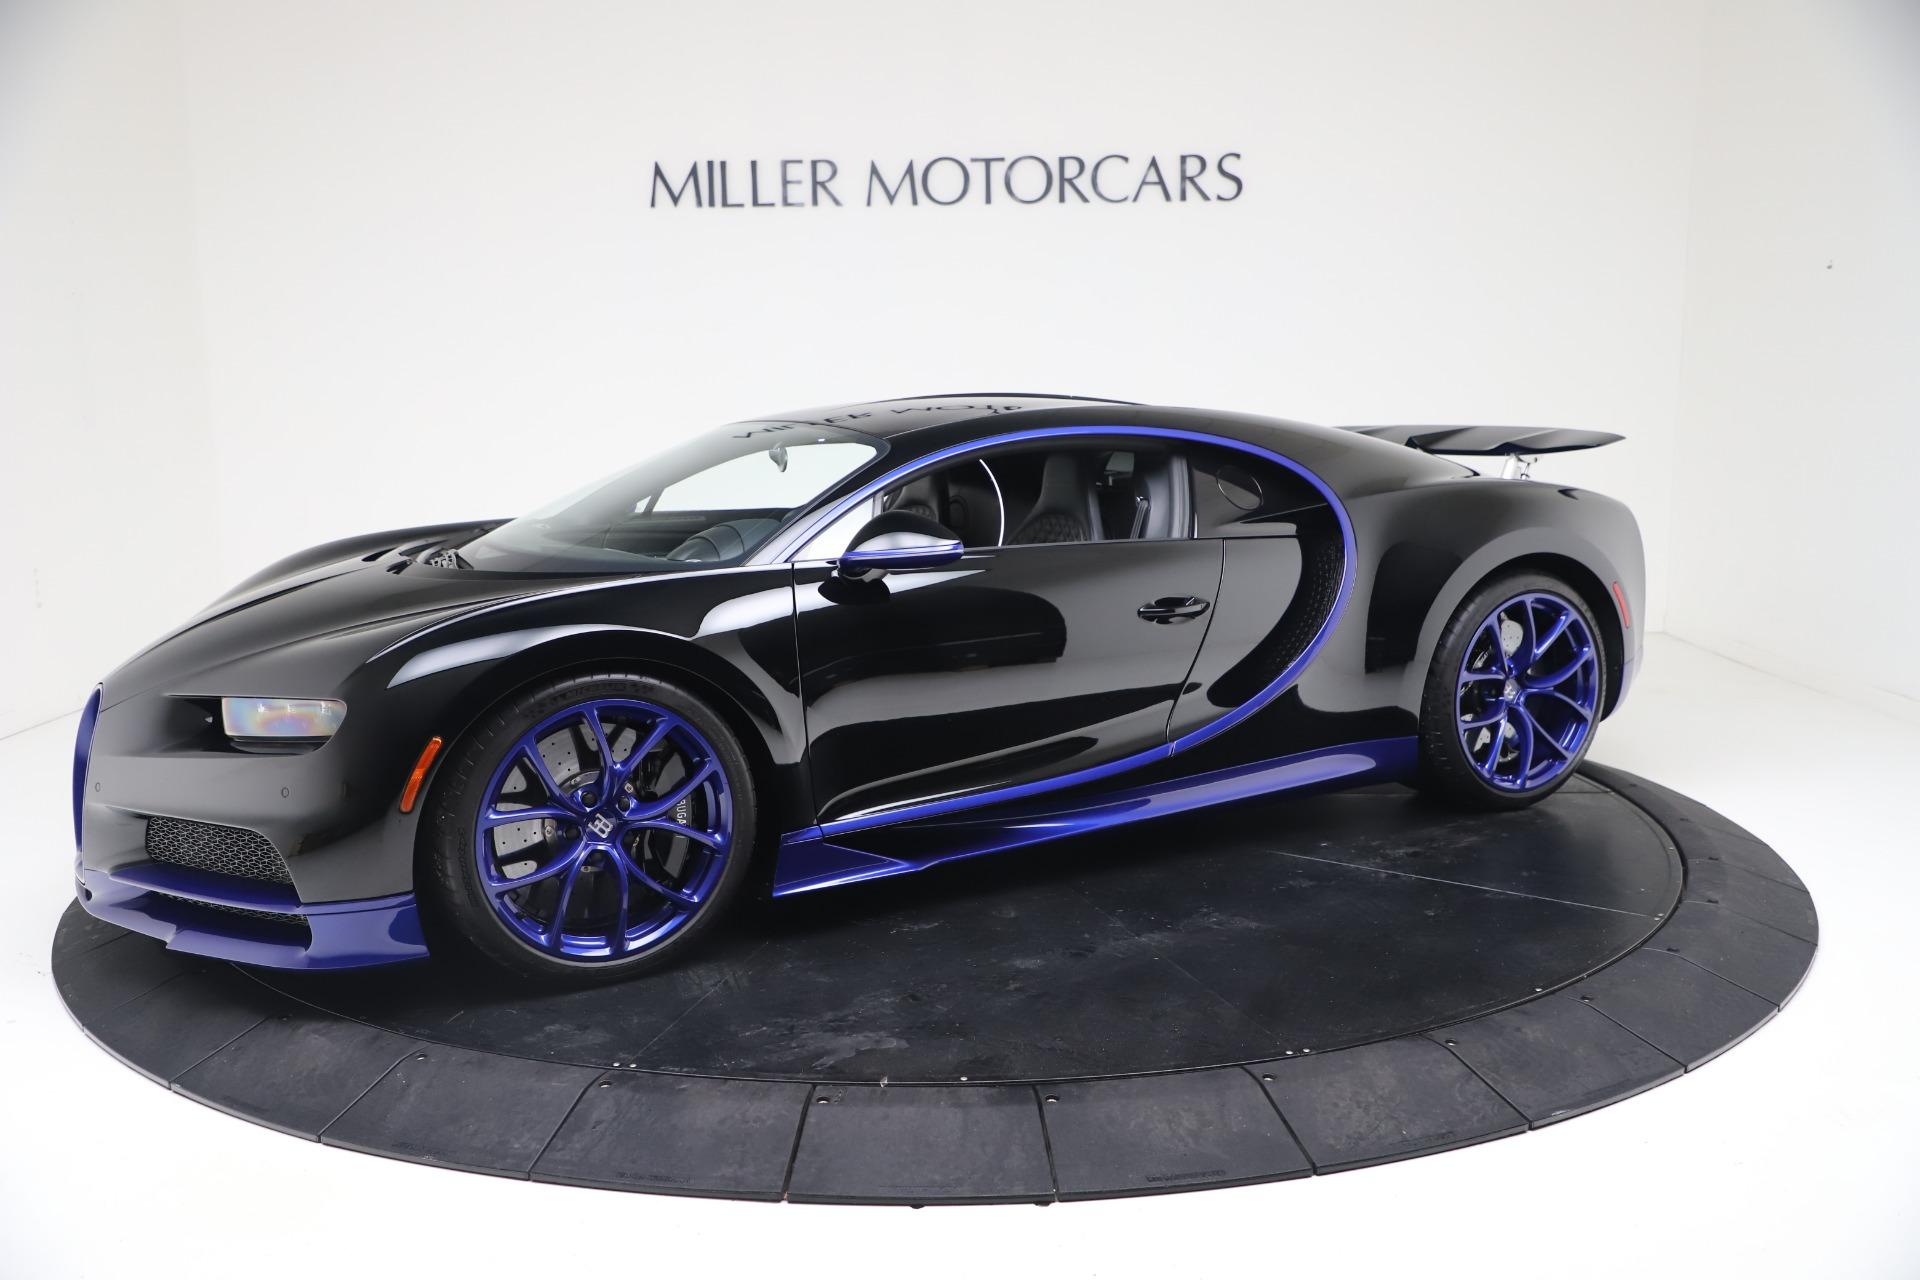 Used 2018 Bugatti Chiron for sale Sold at Maserati of Greenwich in Greenwich CT 06830 1